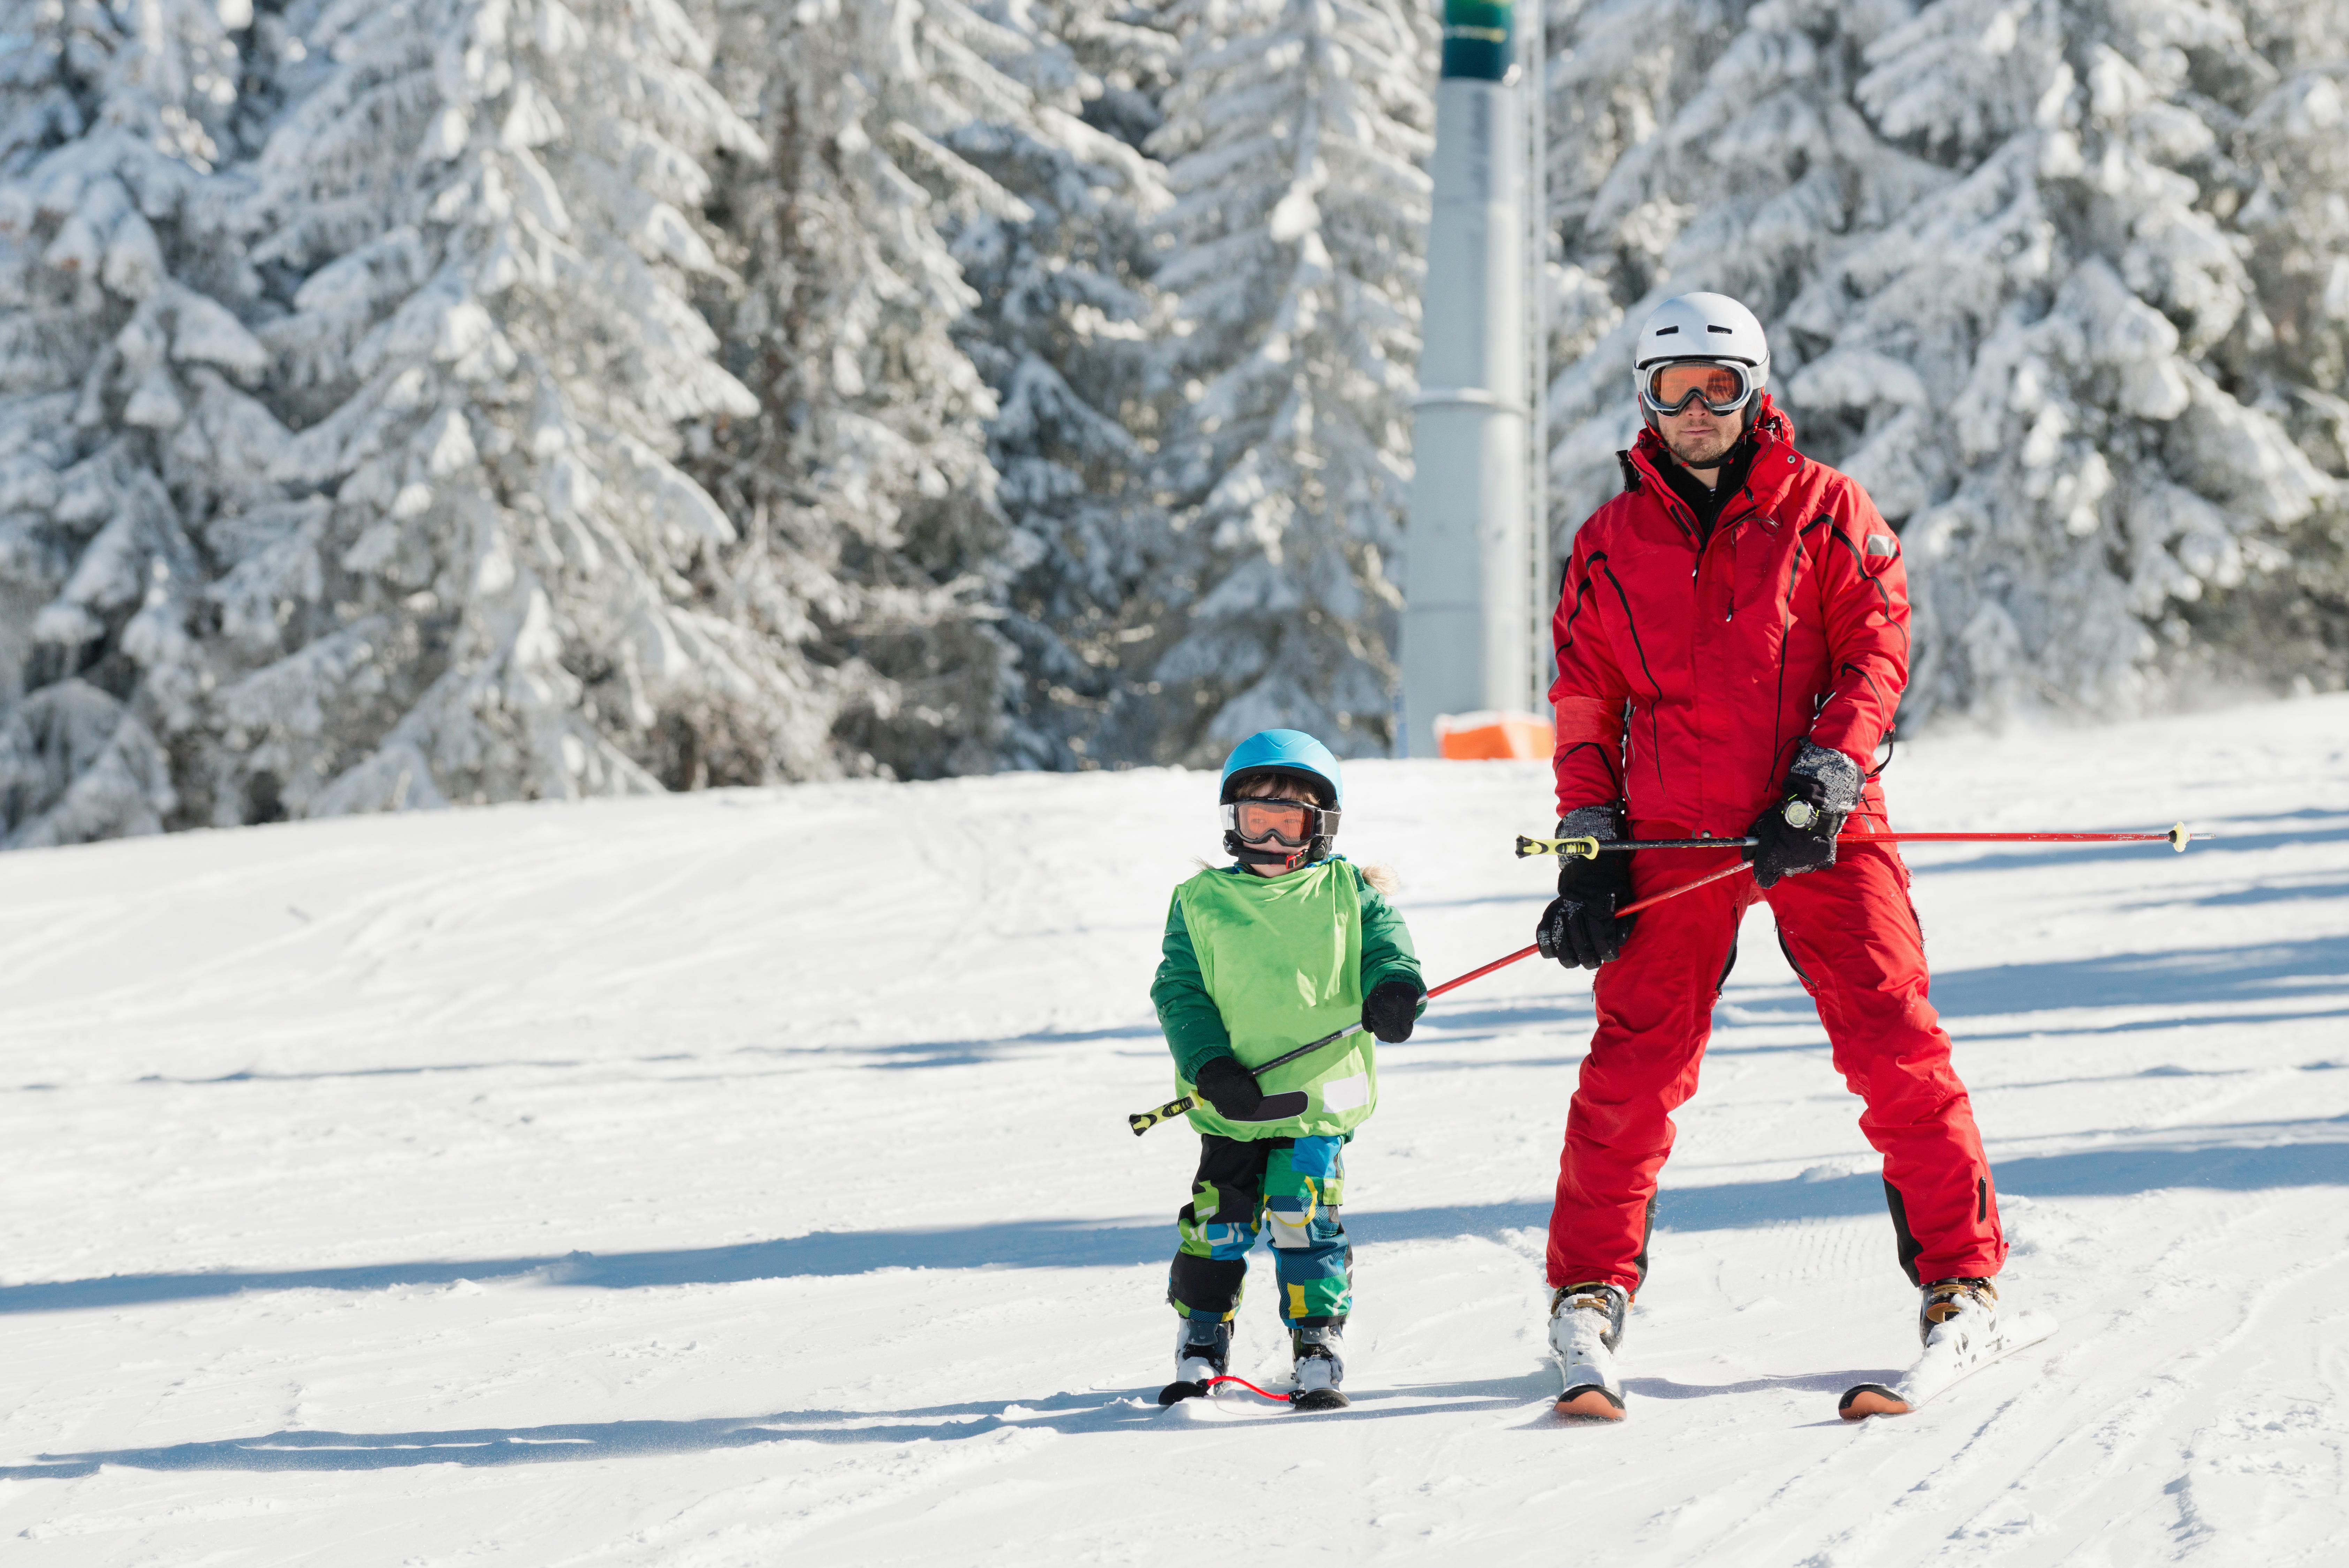 ski-instructor-learning-skiing-P4RDMTP (2)